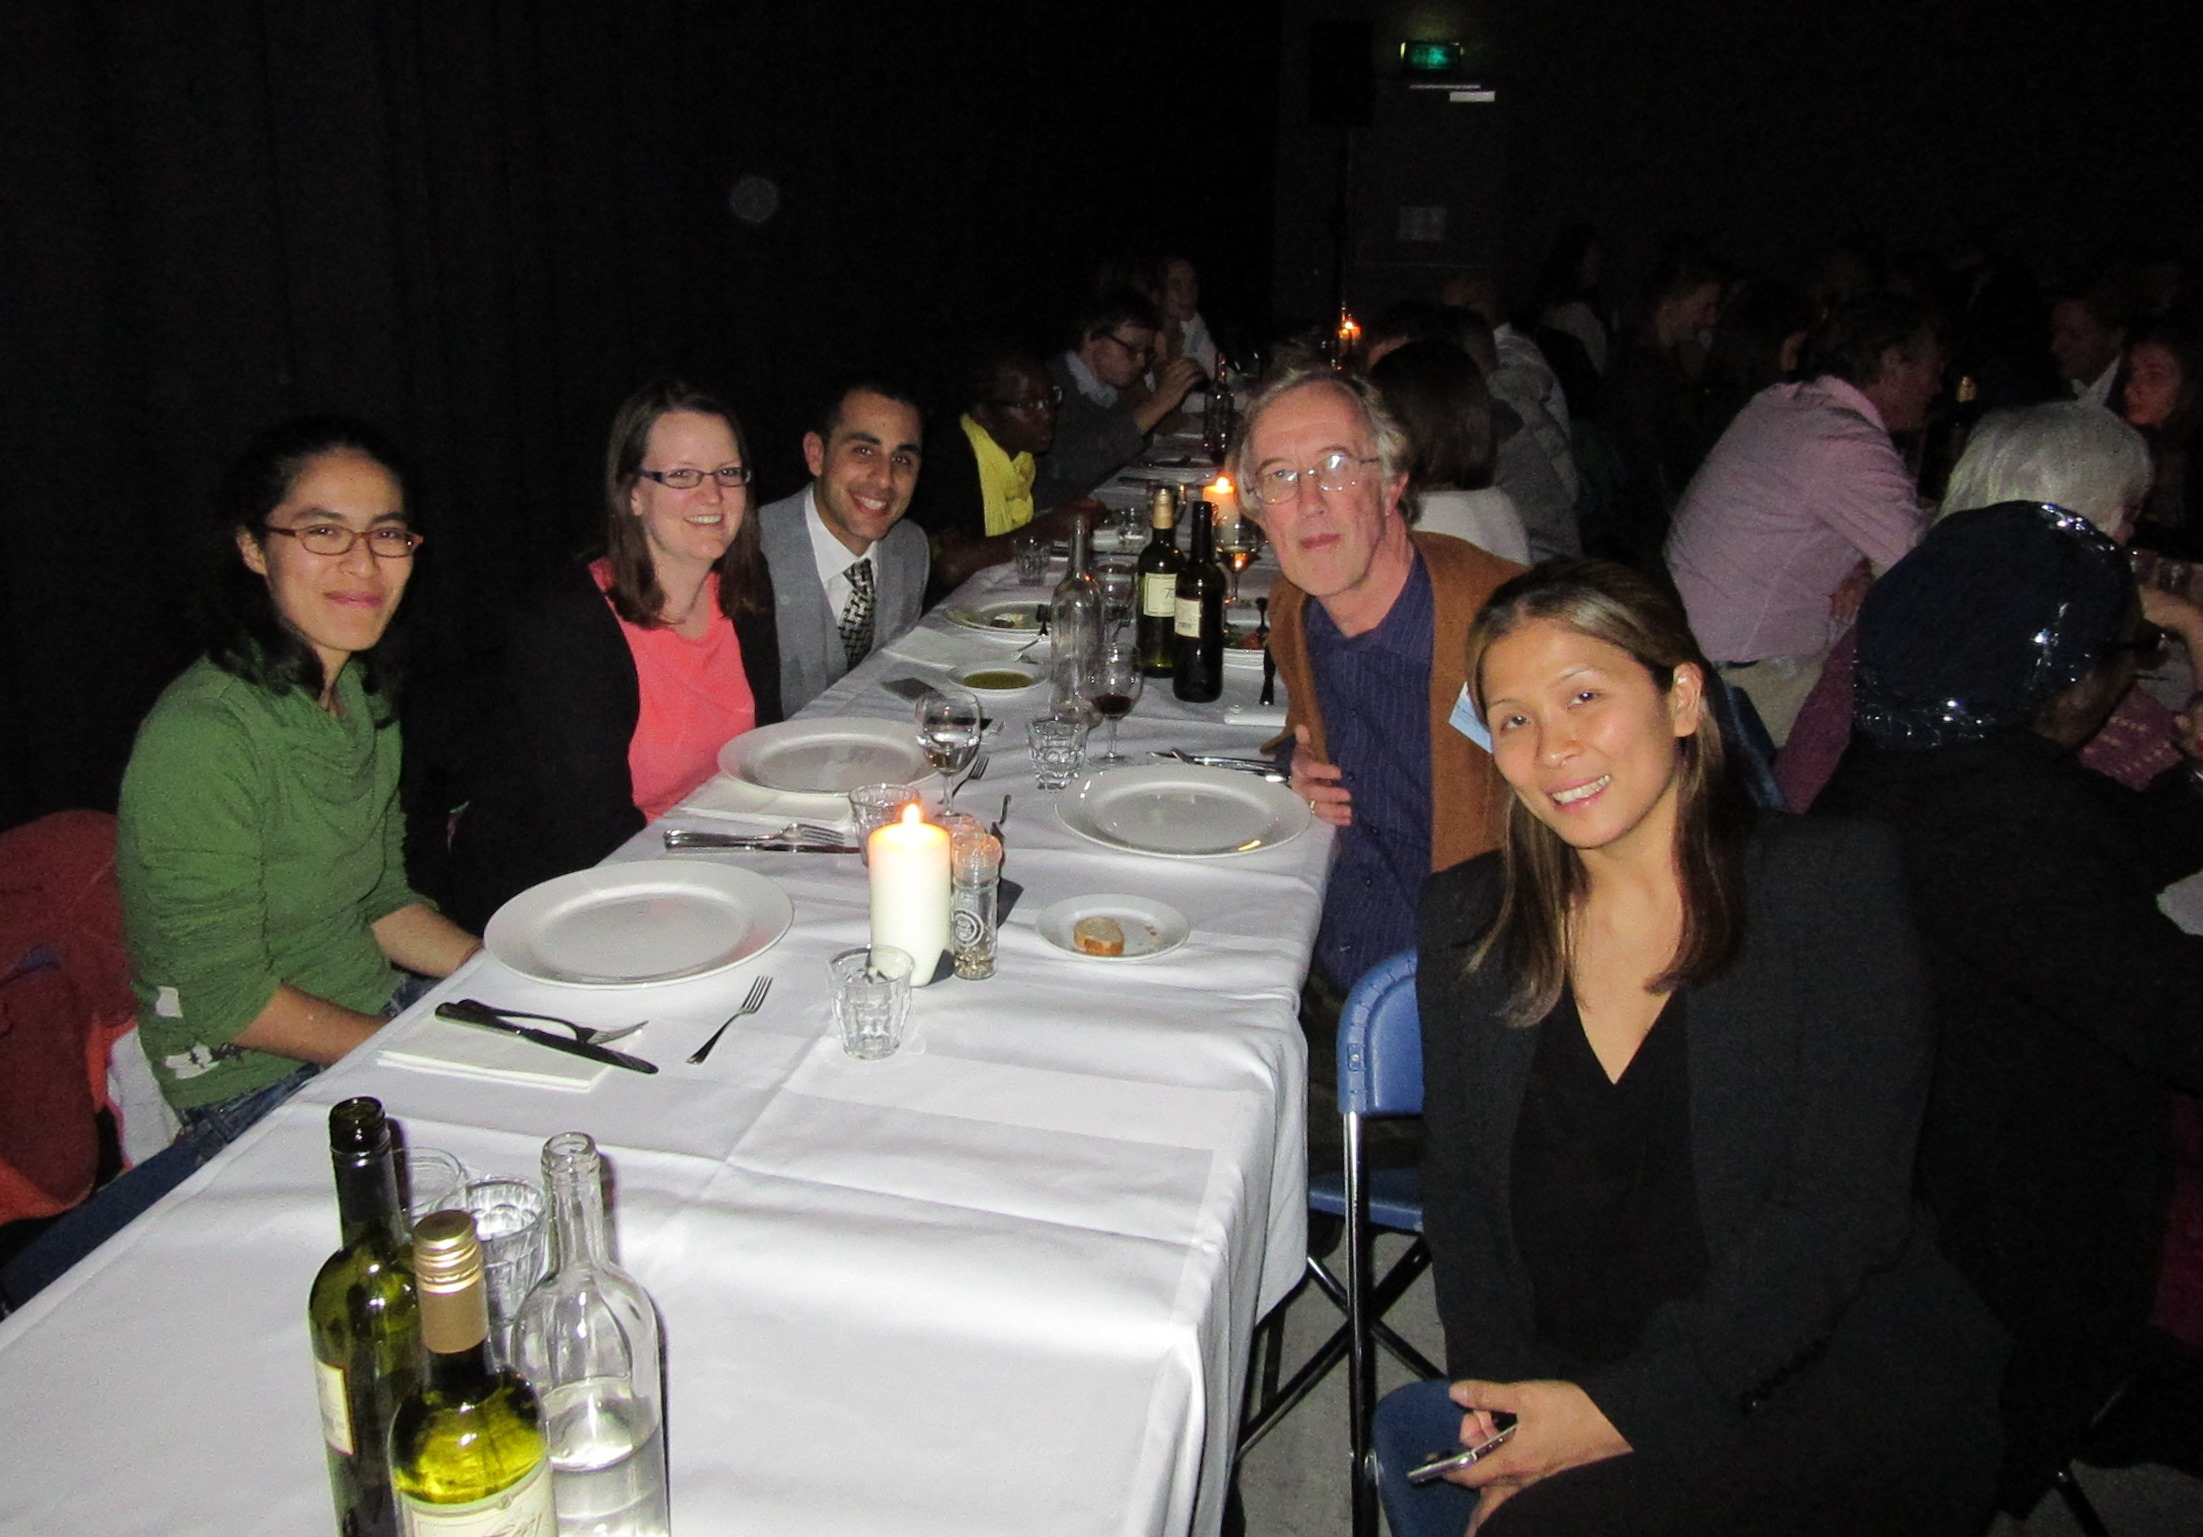 Some of the ICES team at Amsterdam; Jane Maraka, Haadi Shalabi, Michael Cotton, Jaymie Henry